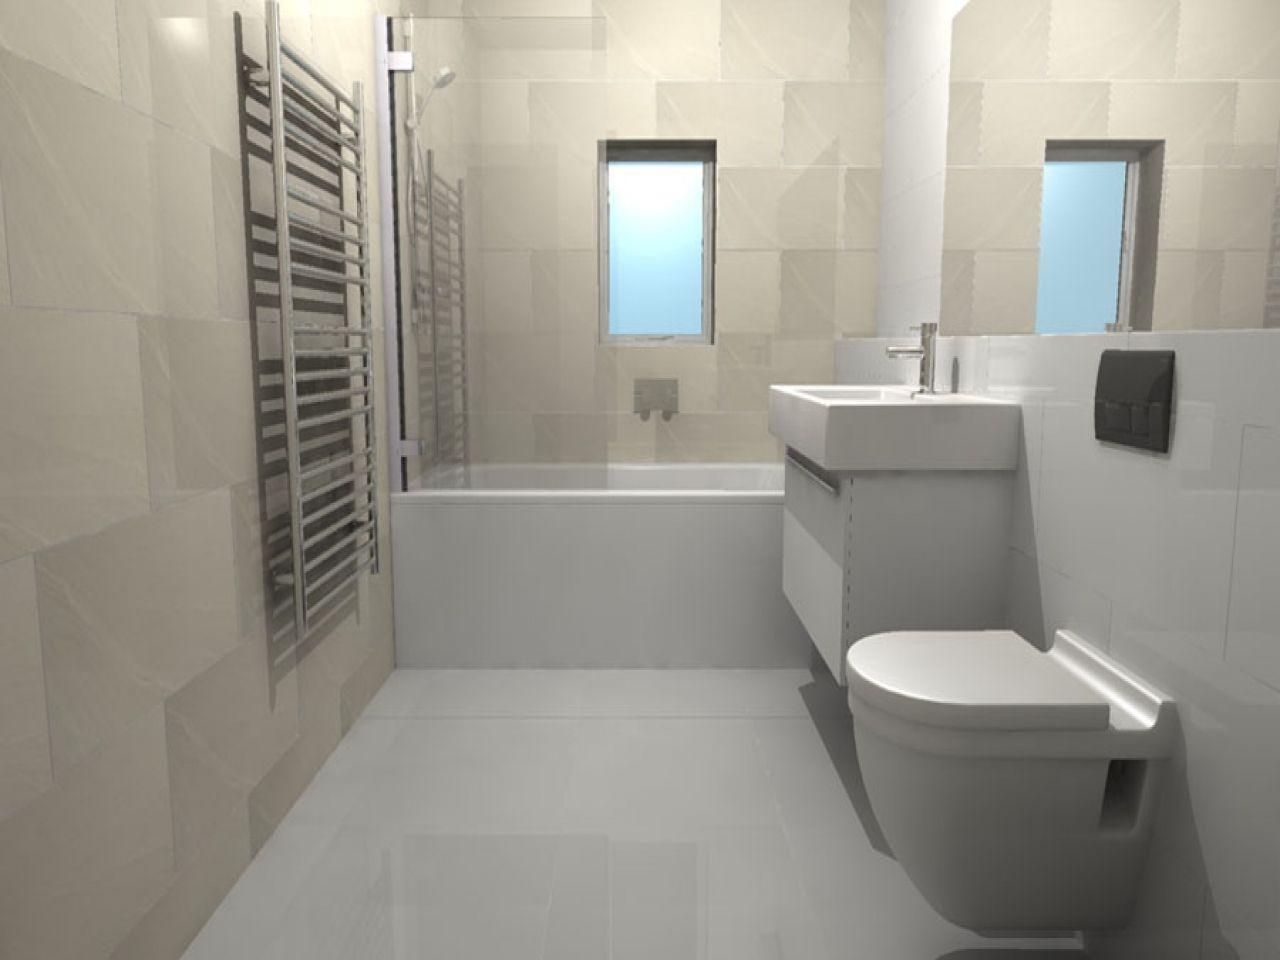 Long Bathroom Mirror Large Tile Small Bathroom Ideas Bathroom Tiles For Small Bathrooms Http Bathroom Design Small Bathroom Ideas Uk Grey Bathroom Wall Tiles